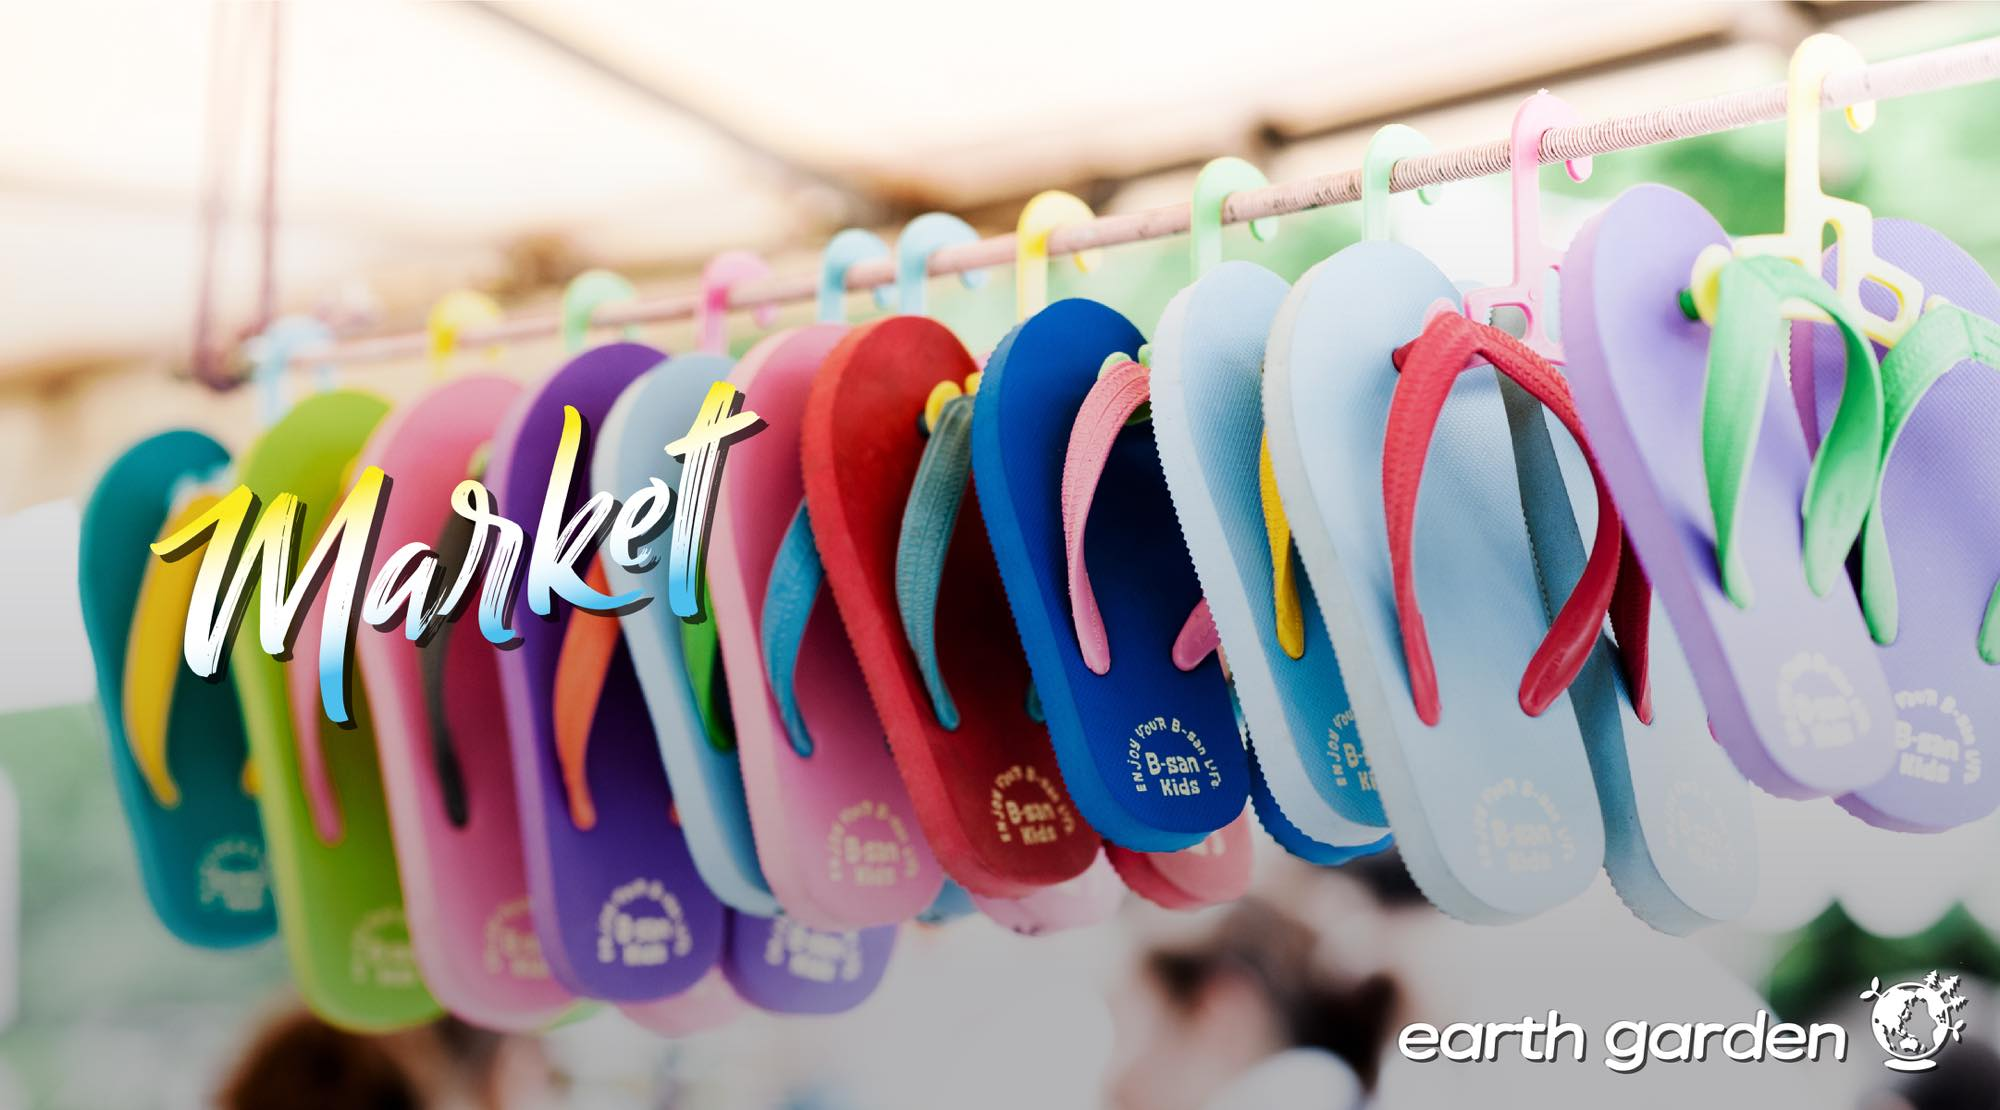 s_1704eg2017夏-market-1-03